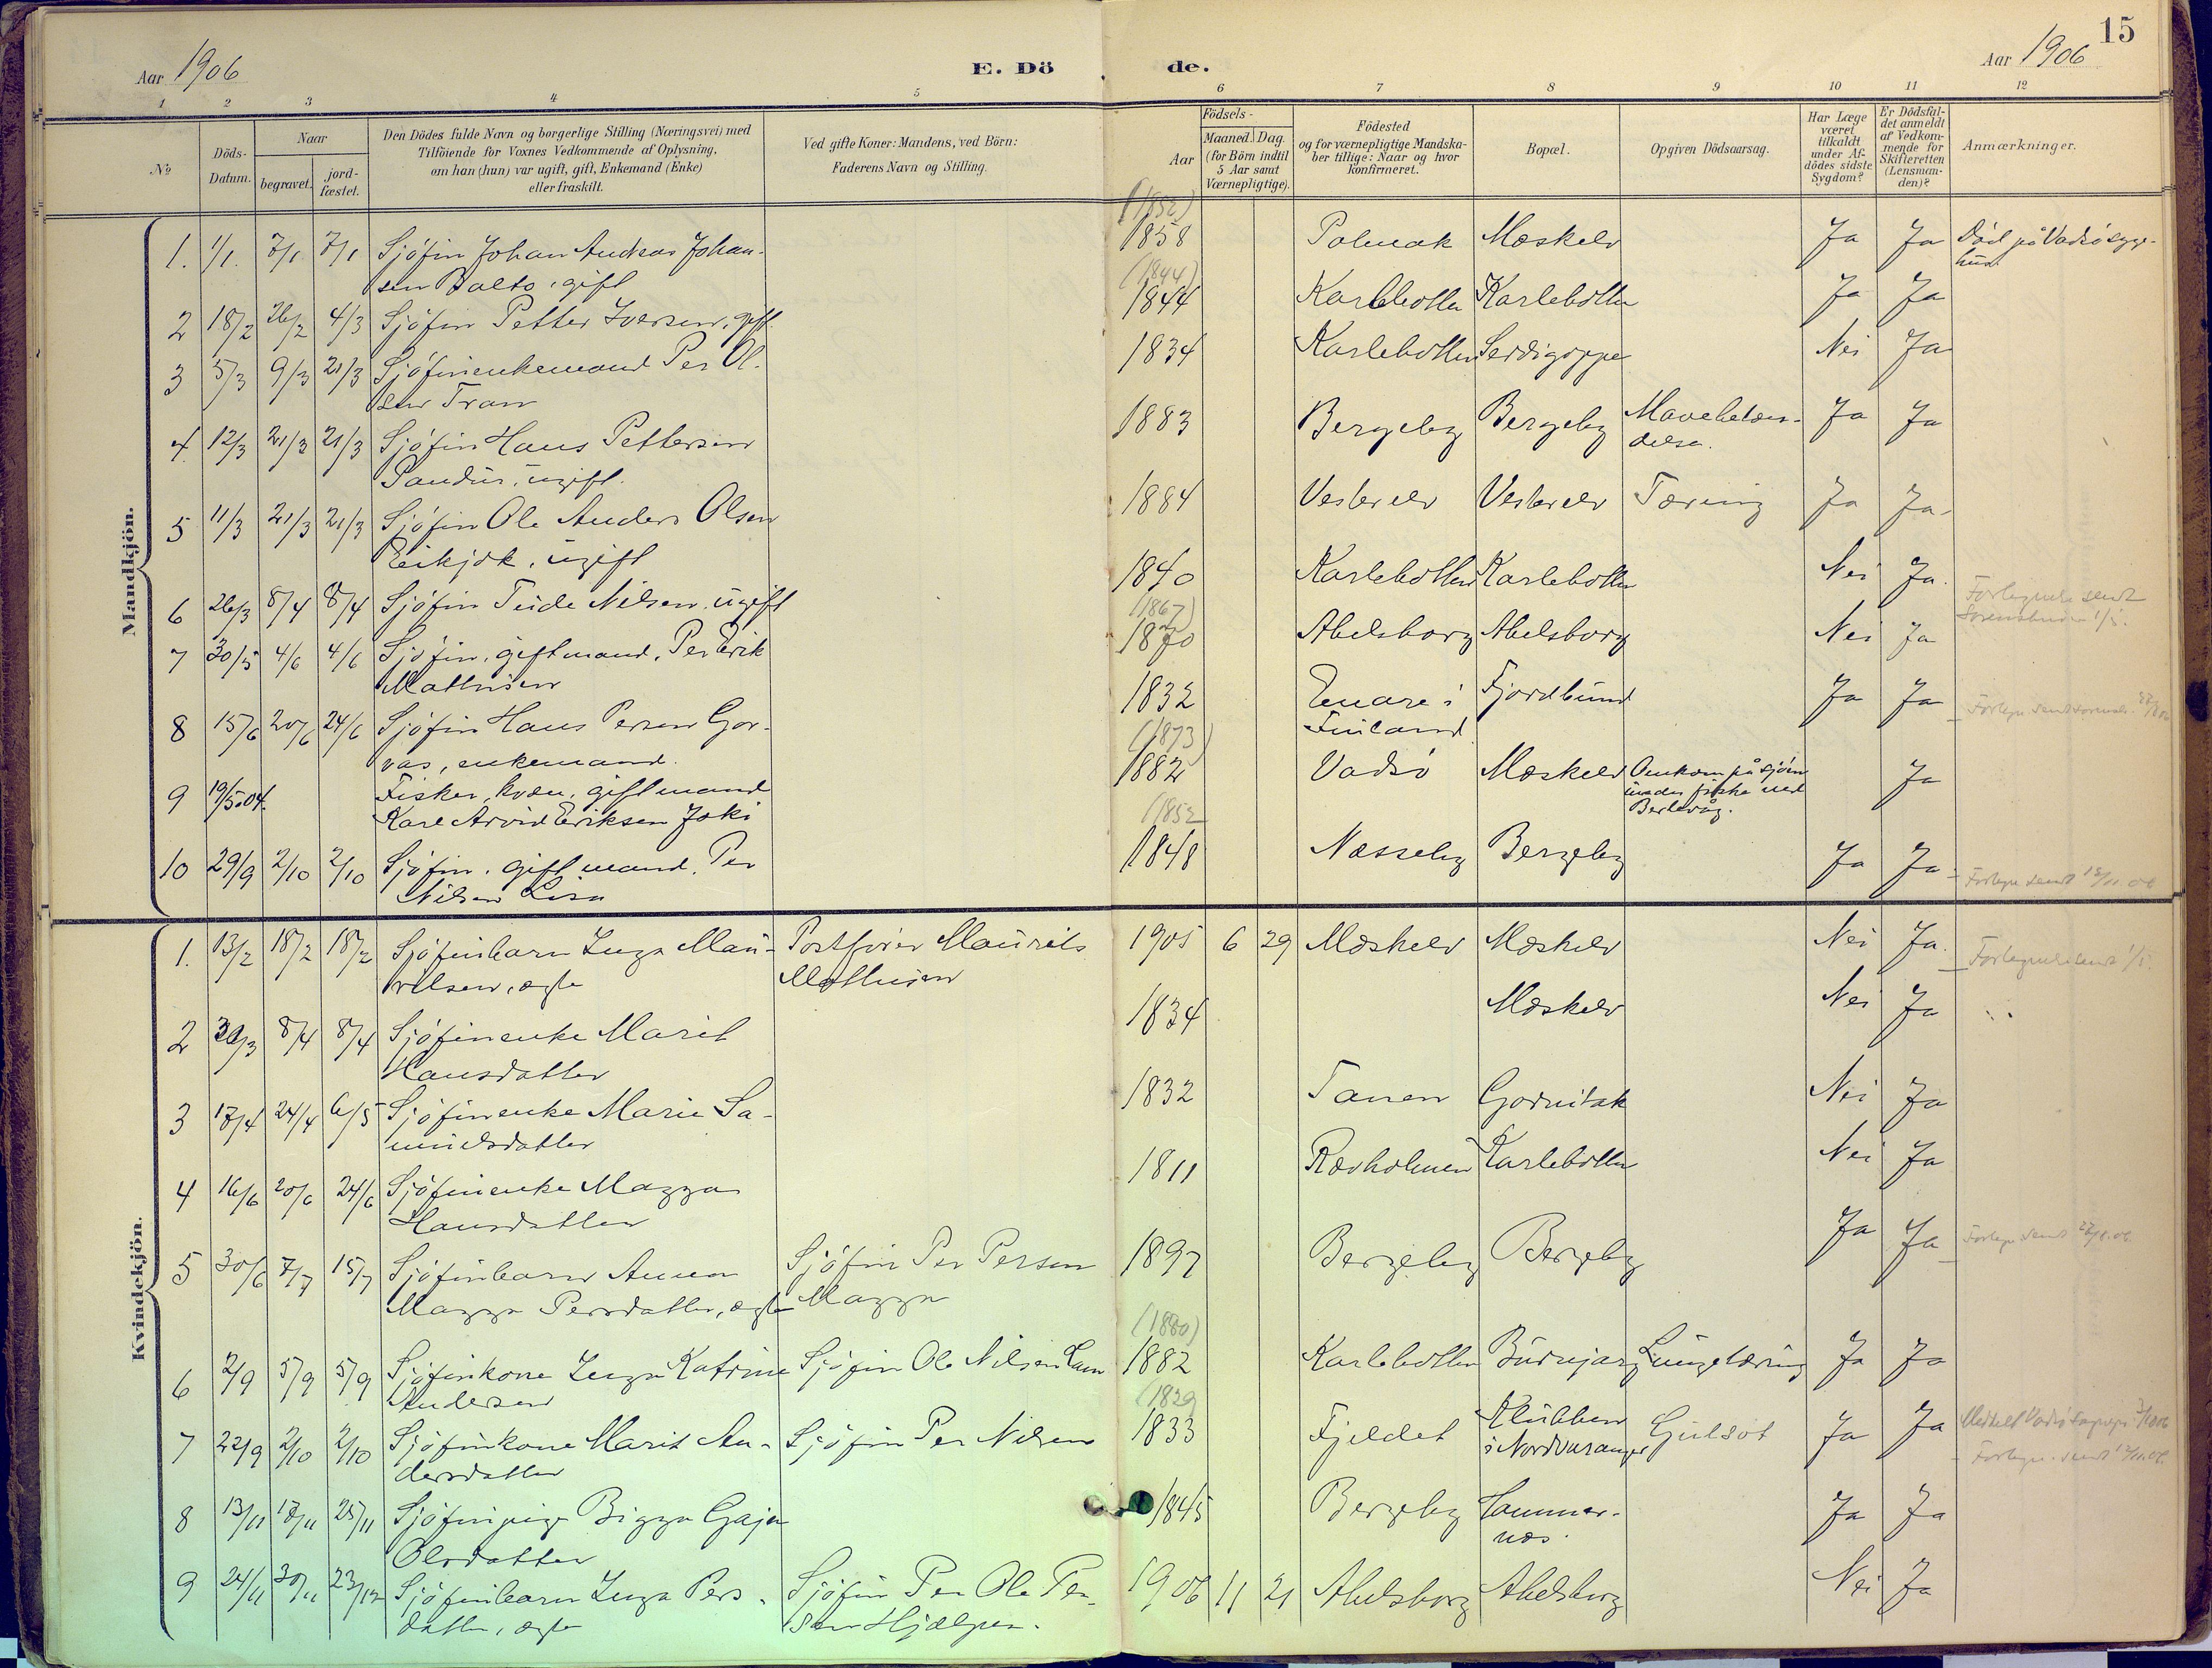 SATØ, Nesseby sokneprestkontor, H/Ha/L0007kirke: Ministerialbok nr. 7, 1898-1921, s. 15